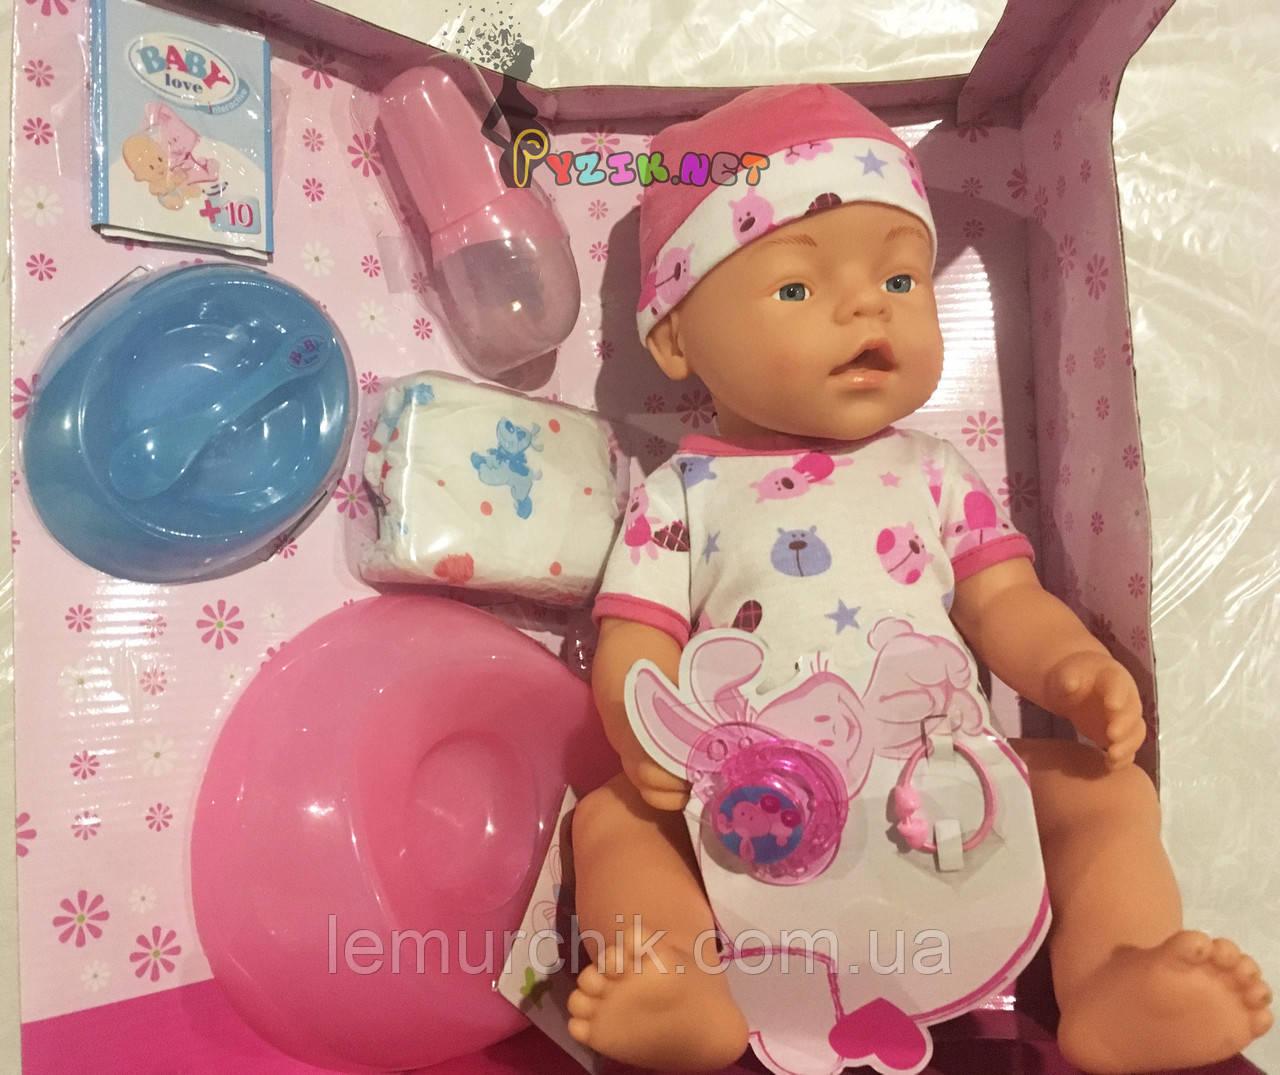 Кукла-пупс Baby born с аксессуарами, 6 функций